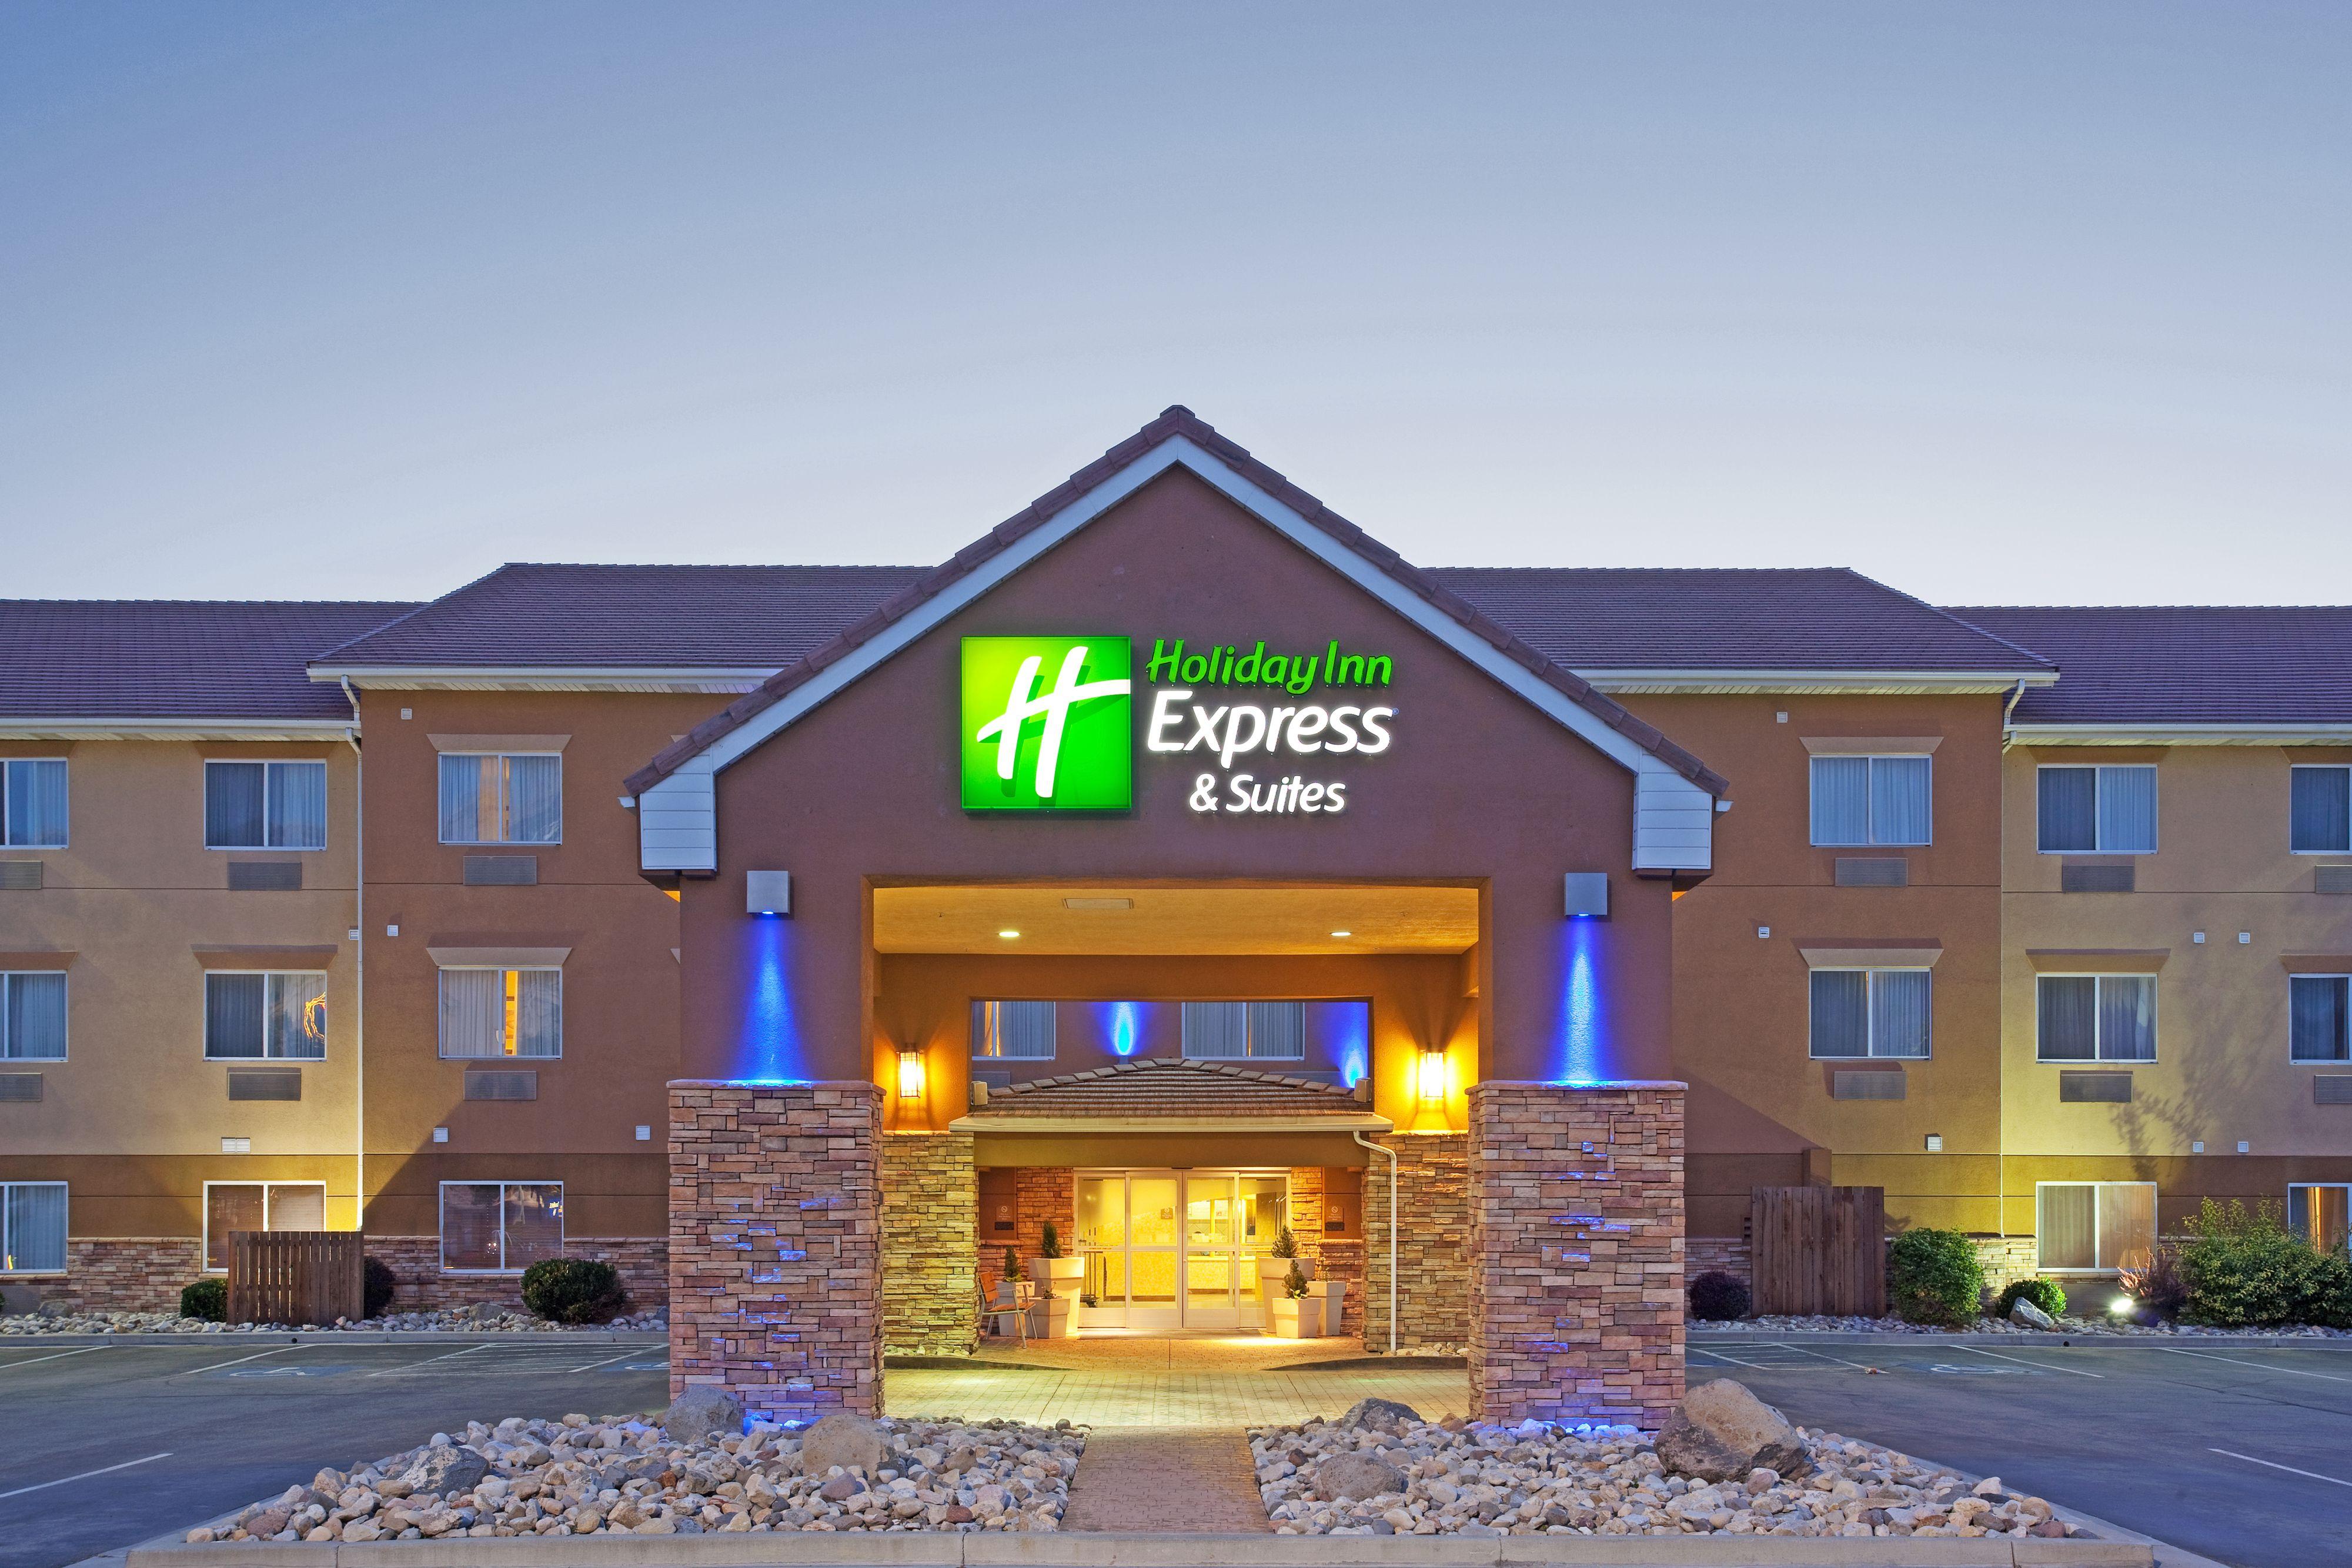 Holiday Inn Express & Suites Sandusky image 0